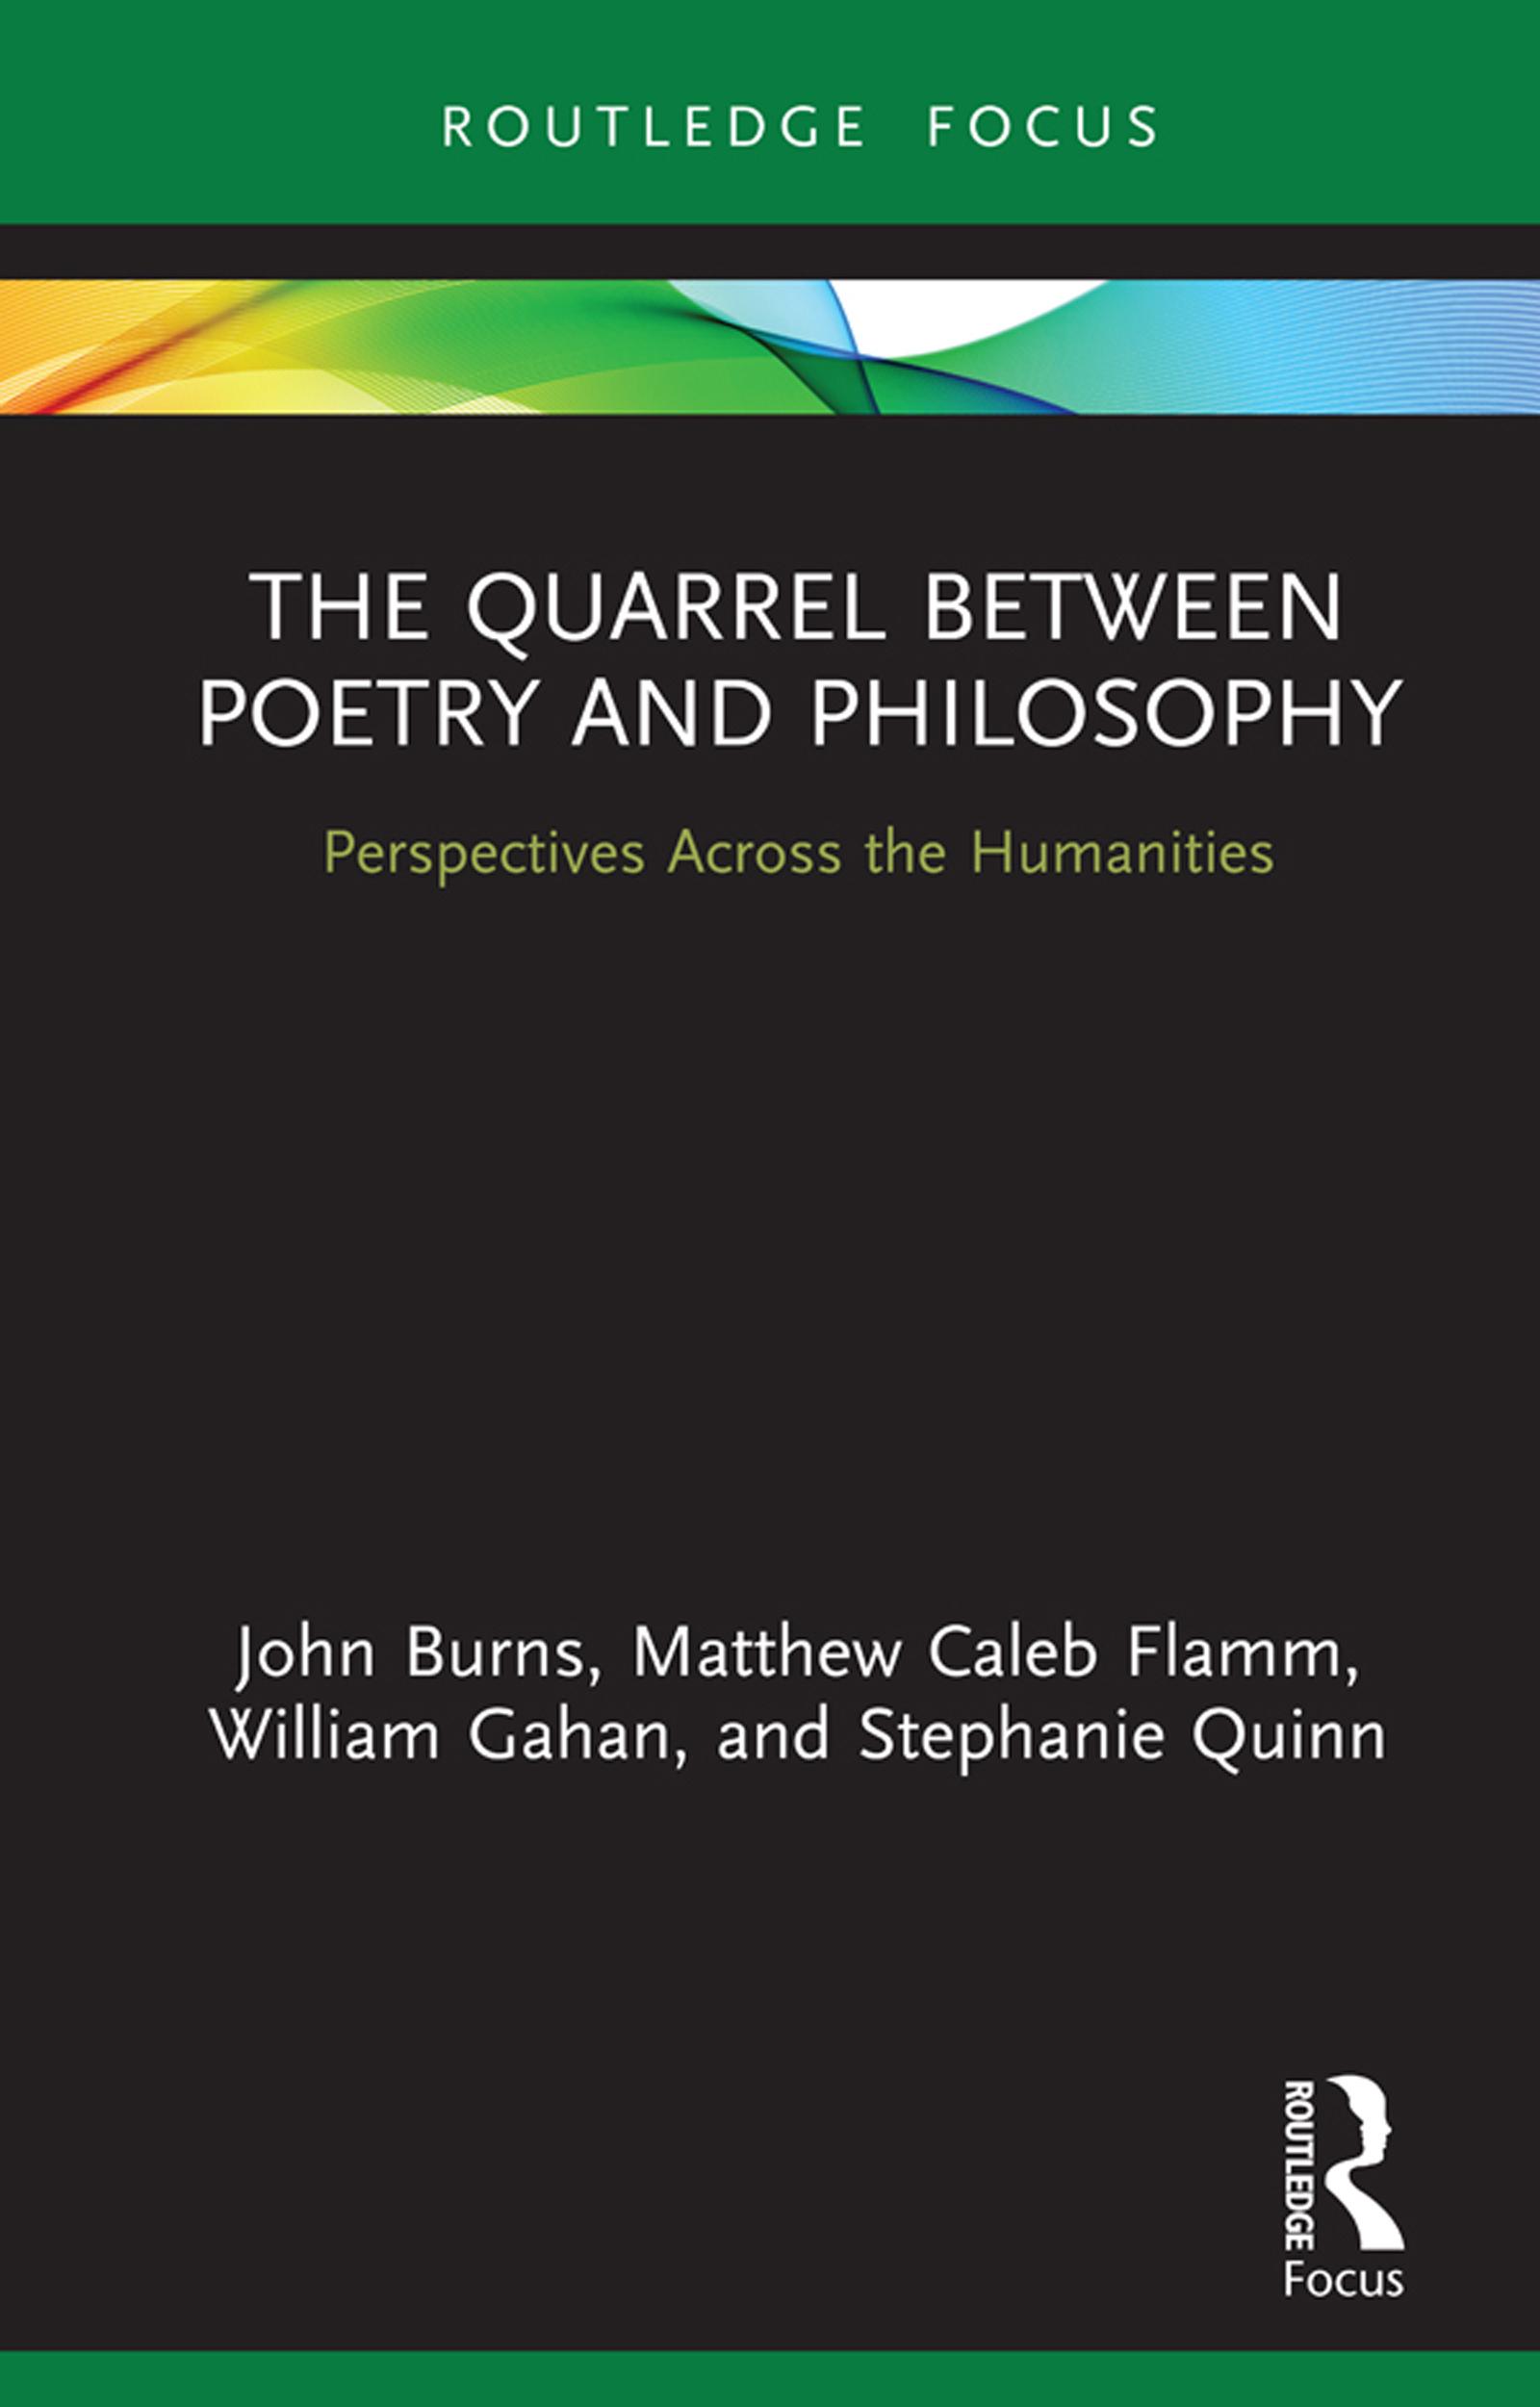 The Quarrel Between Poetry and Philosophy